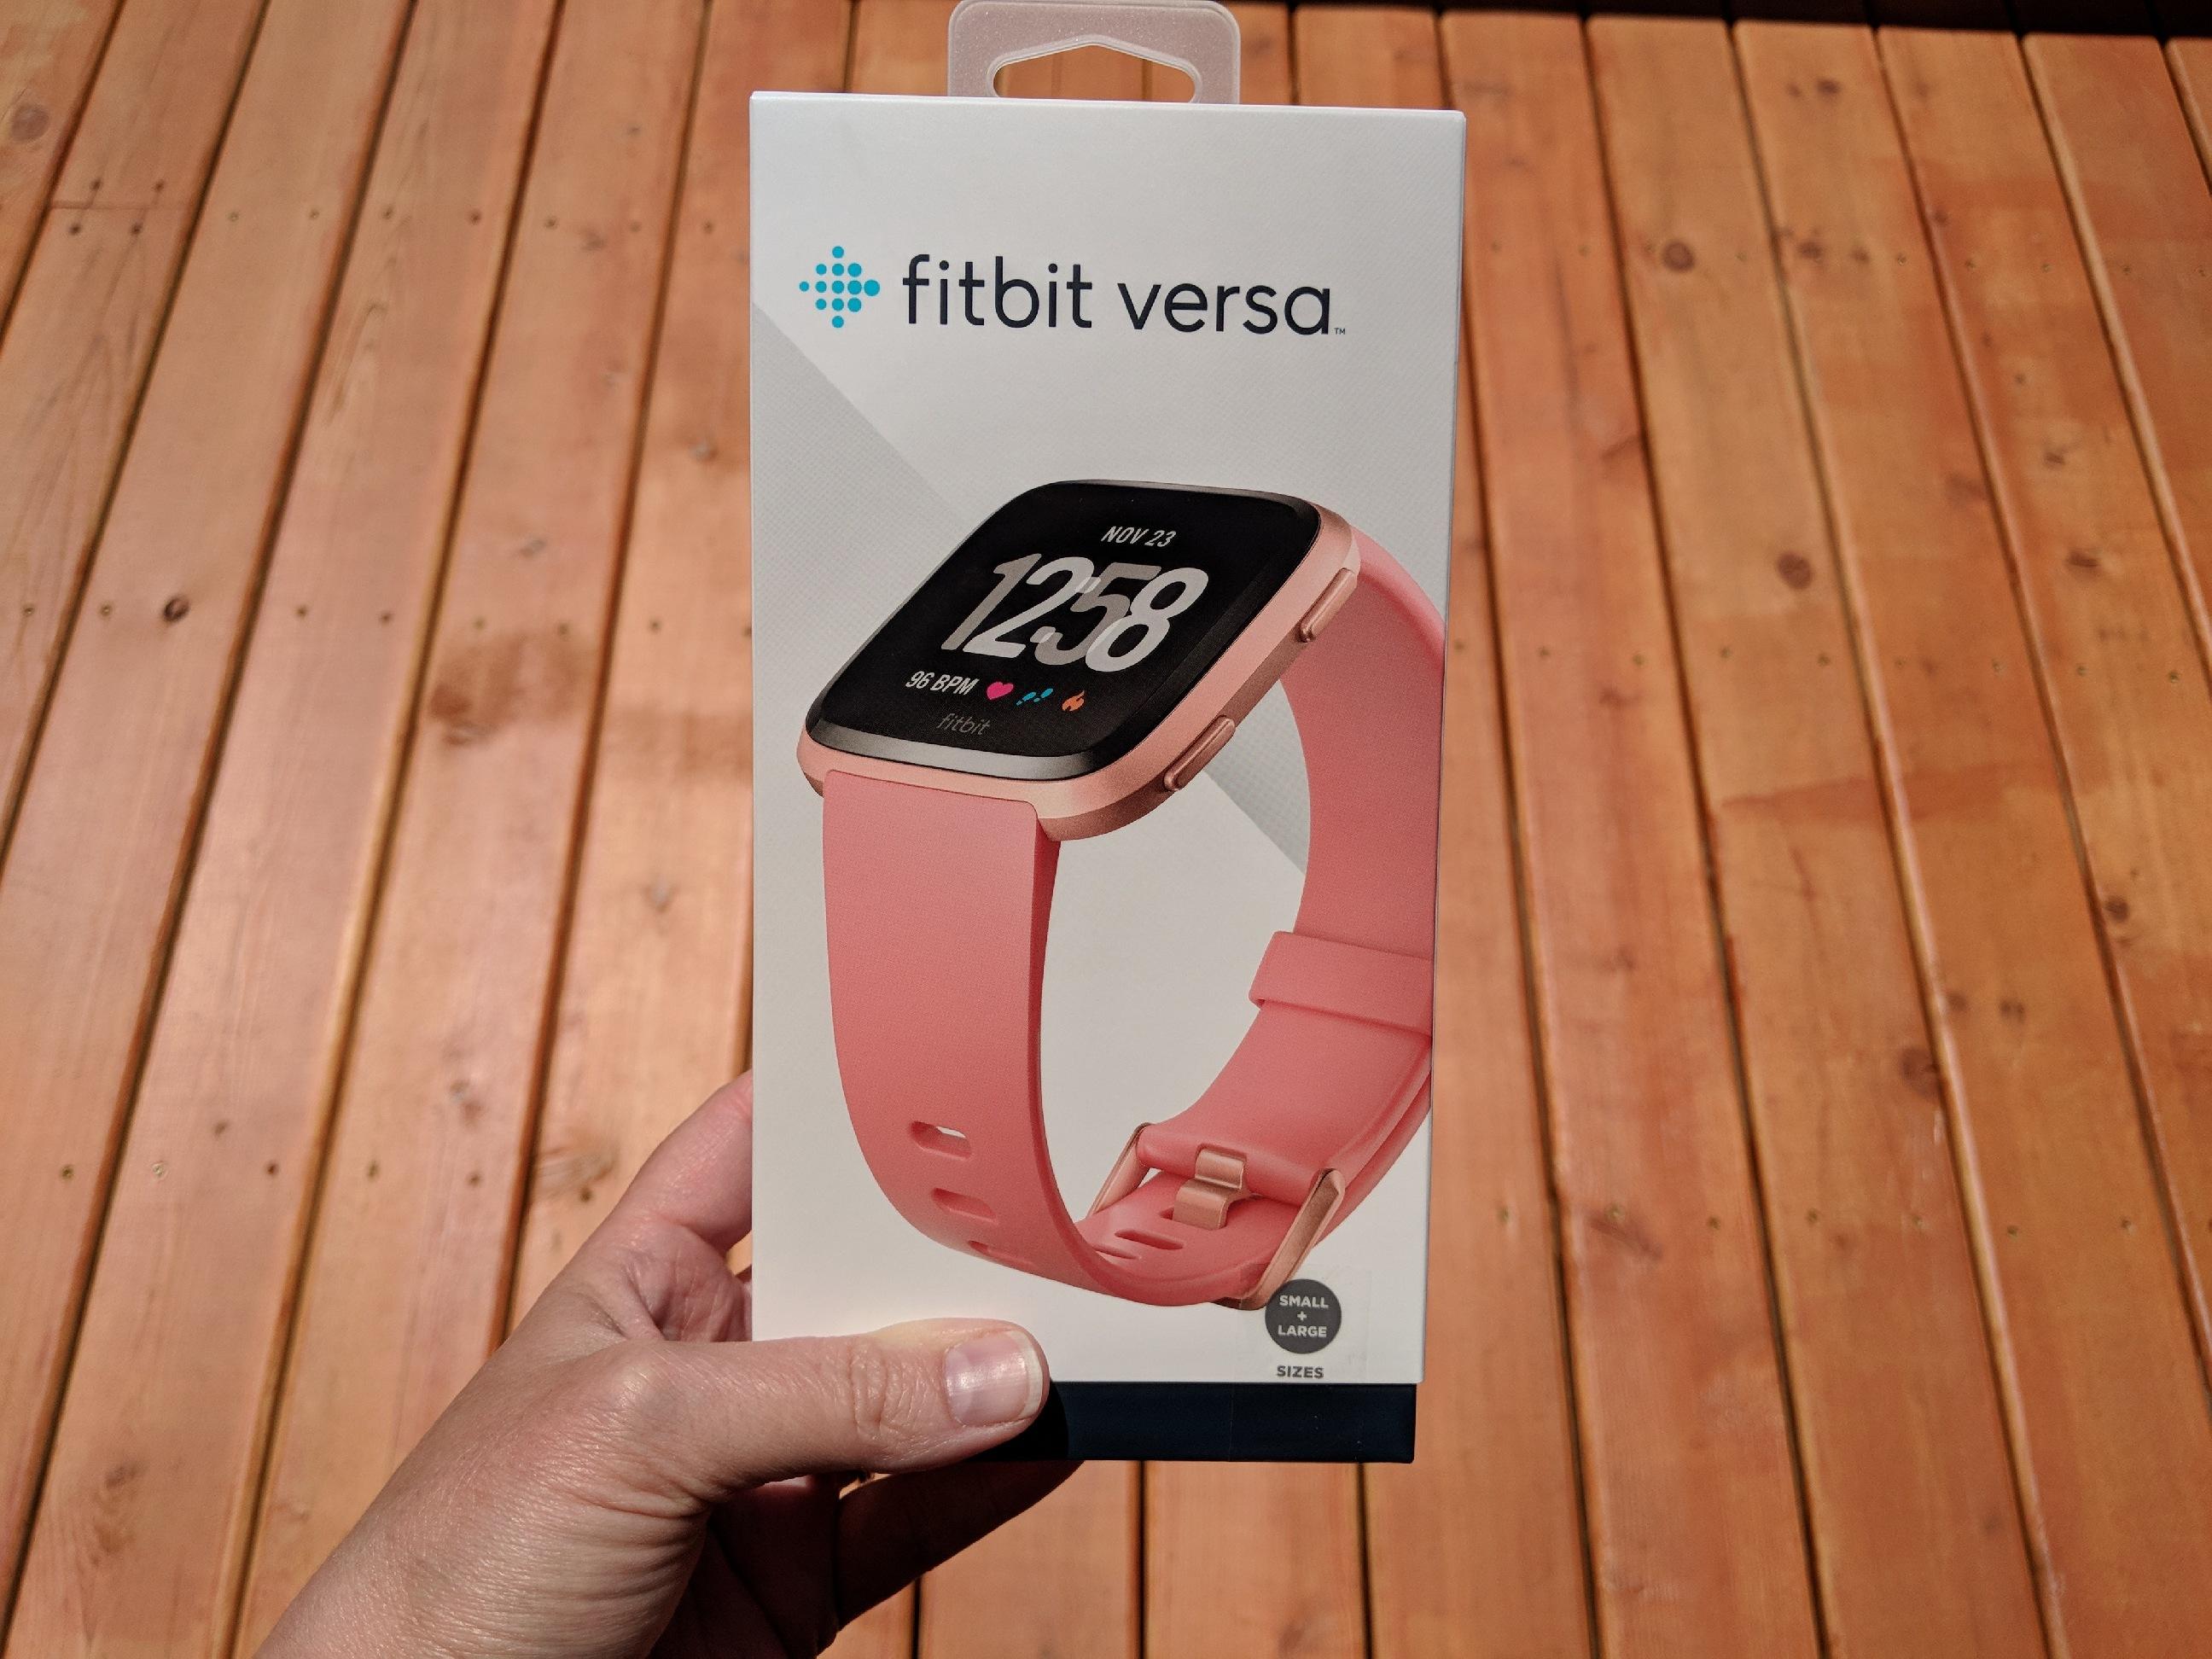 apple watch or fitbit versa? - Fitbit versa box